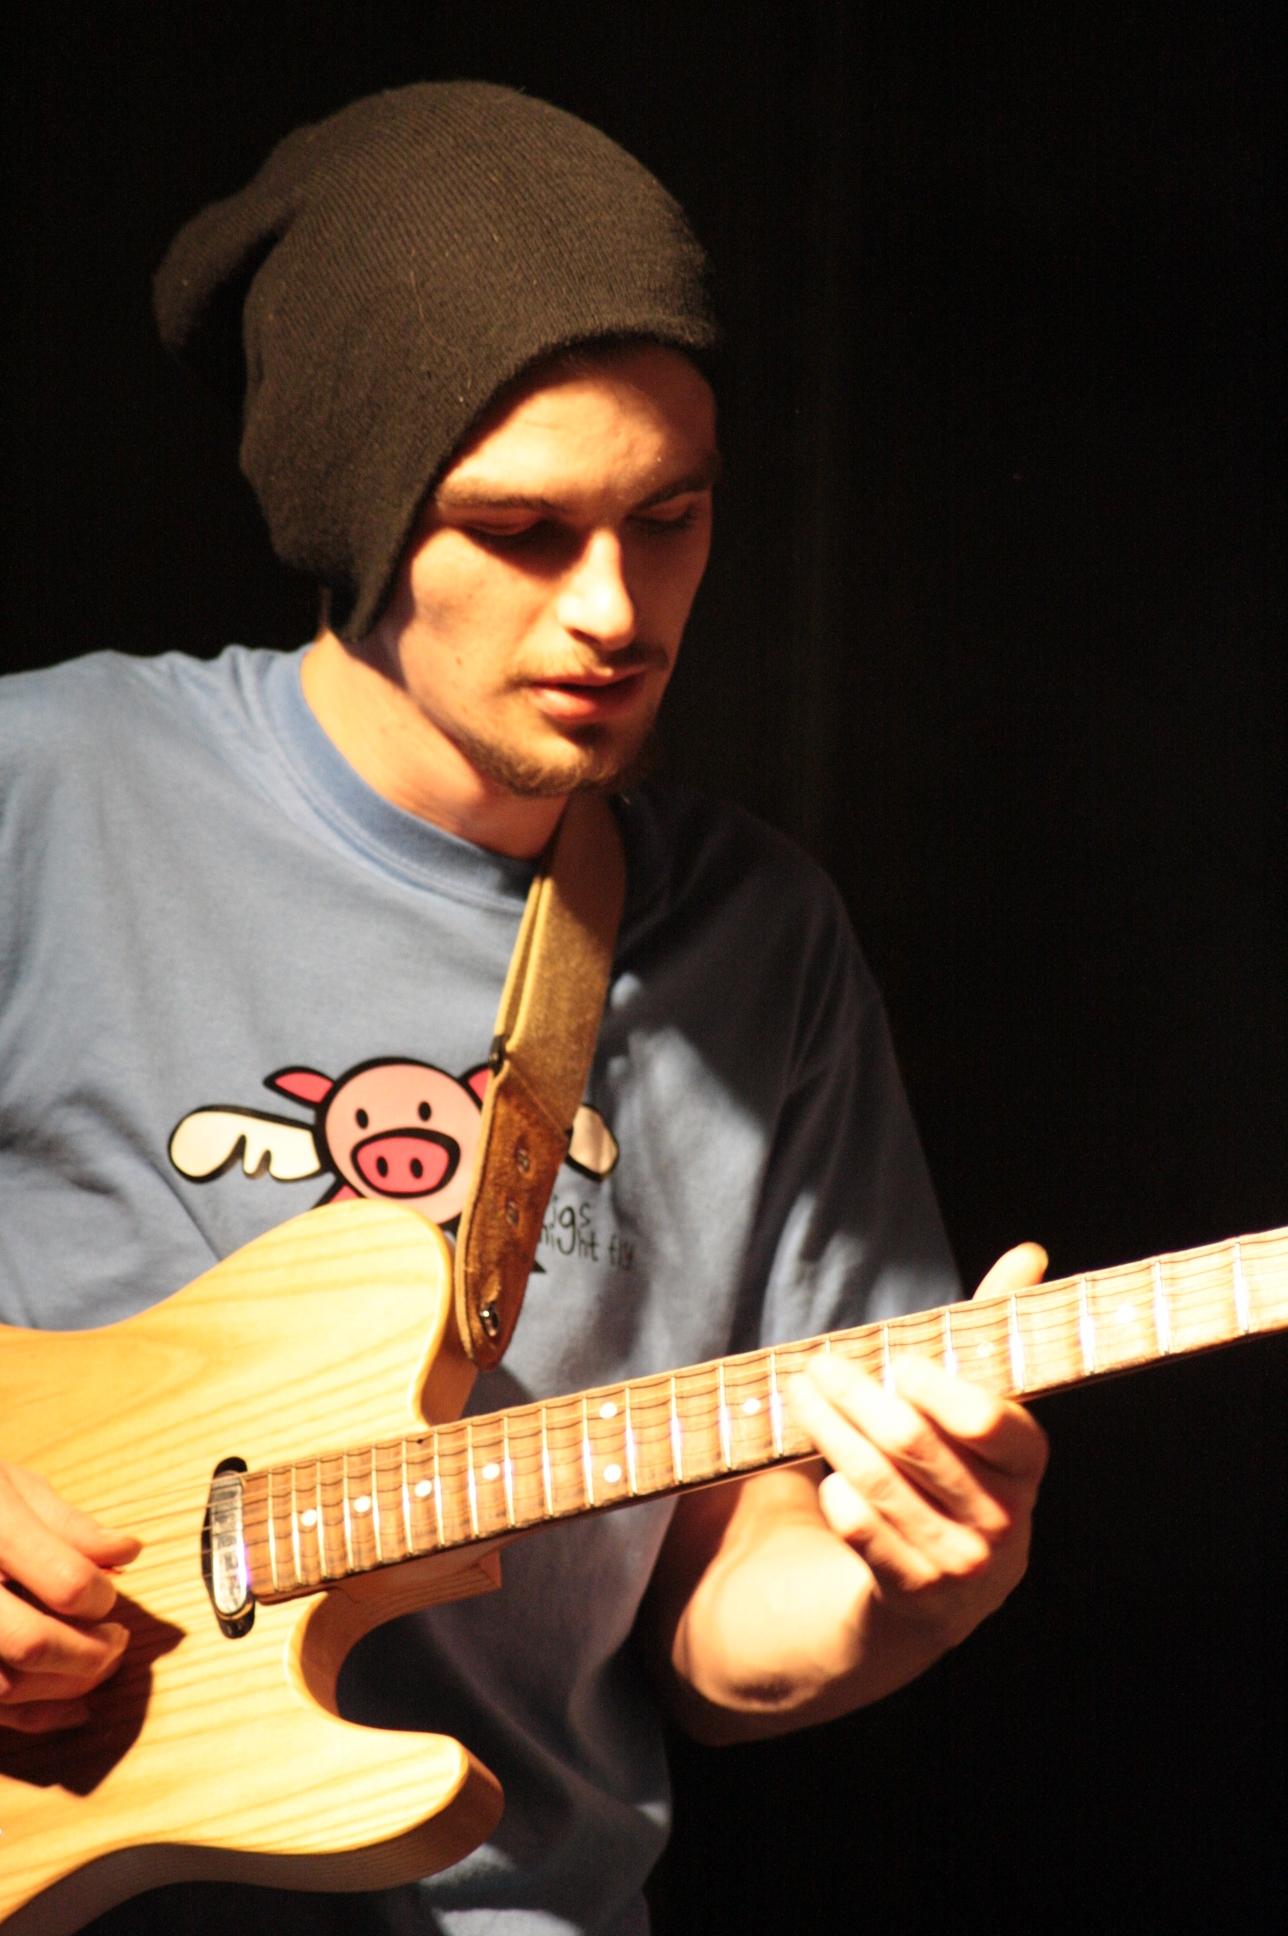 papaJACA - Craig Scot